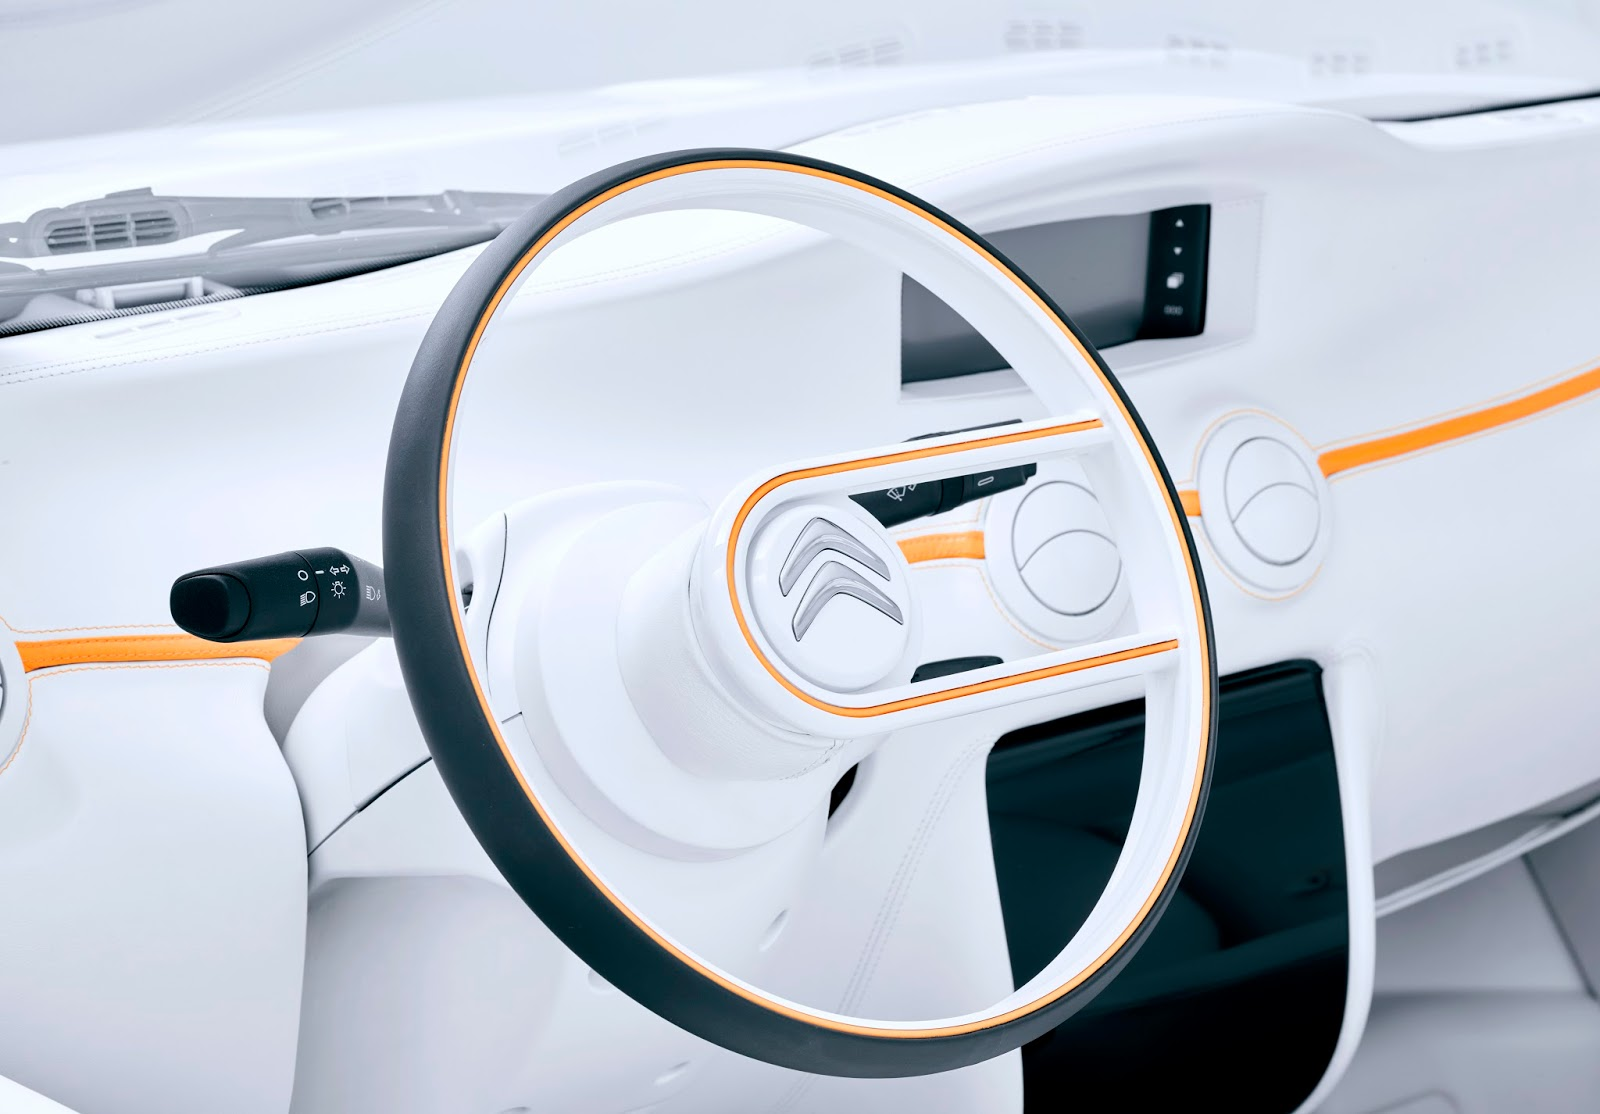 CL 16.021.007 Με 5 Παγκόσμιες Πρεμιέρες η Citroën Στο Σαλόνι Αυτοκινήτου της Γενεύης